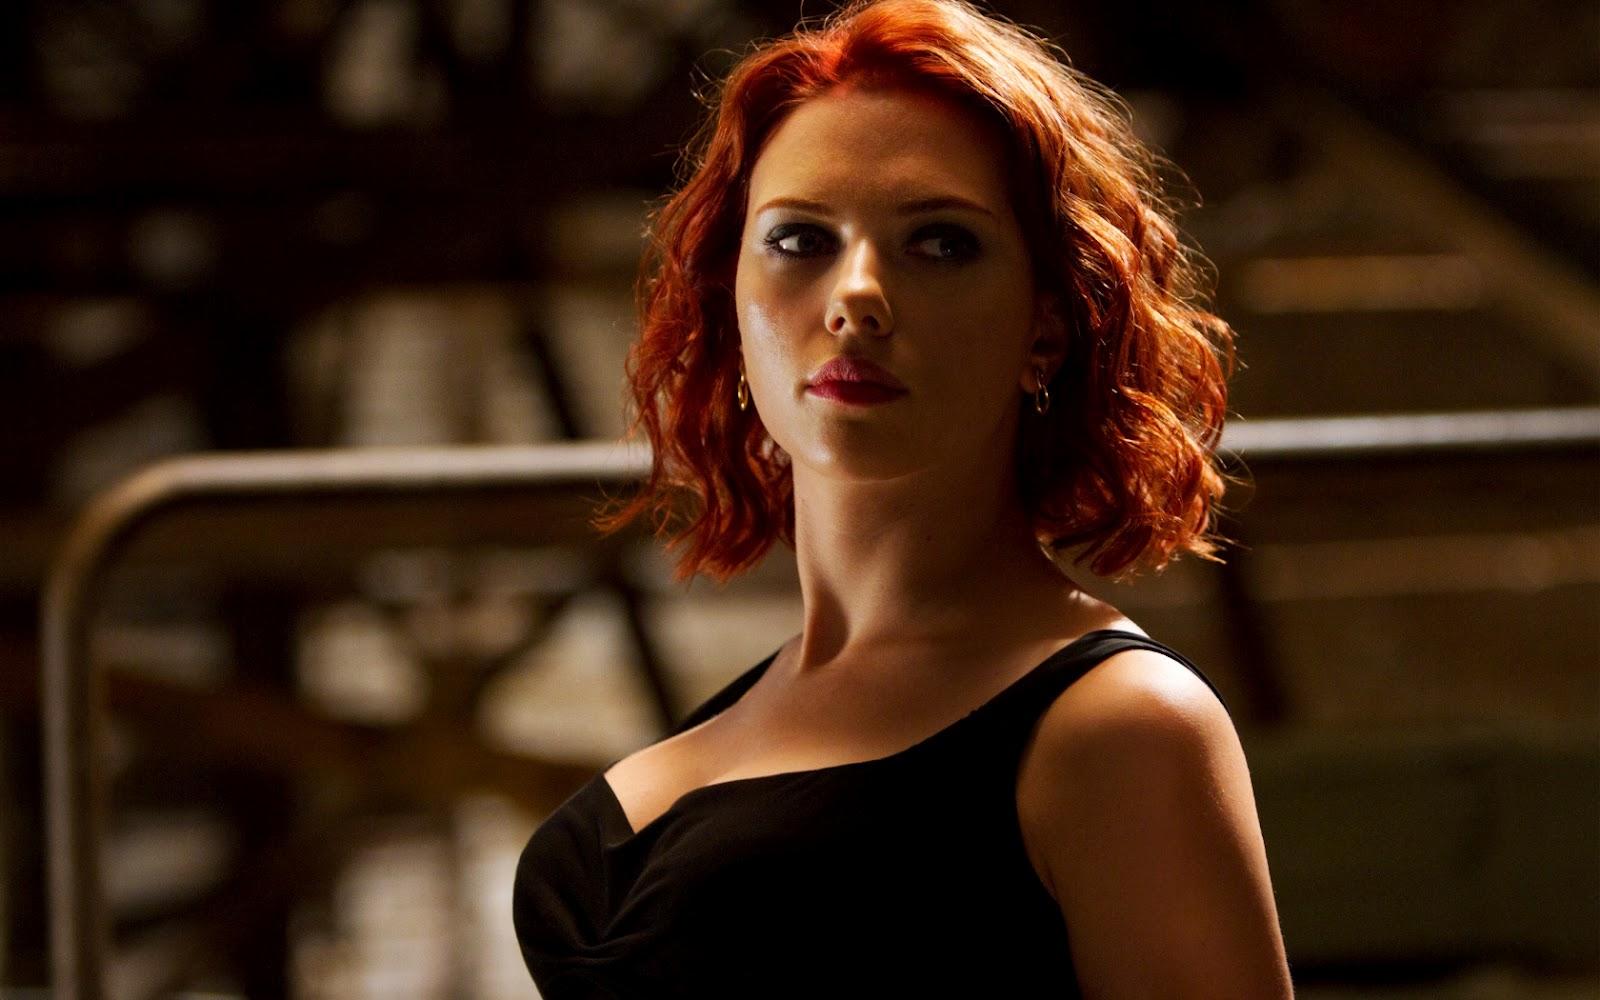 Johansson as Black Widow HD Wallpapers HD Wallpapers Backgrounds 1600x1000